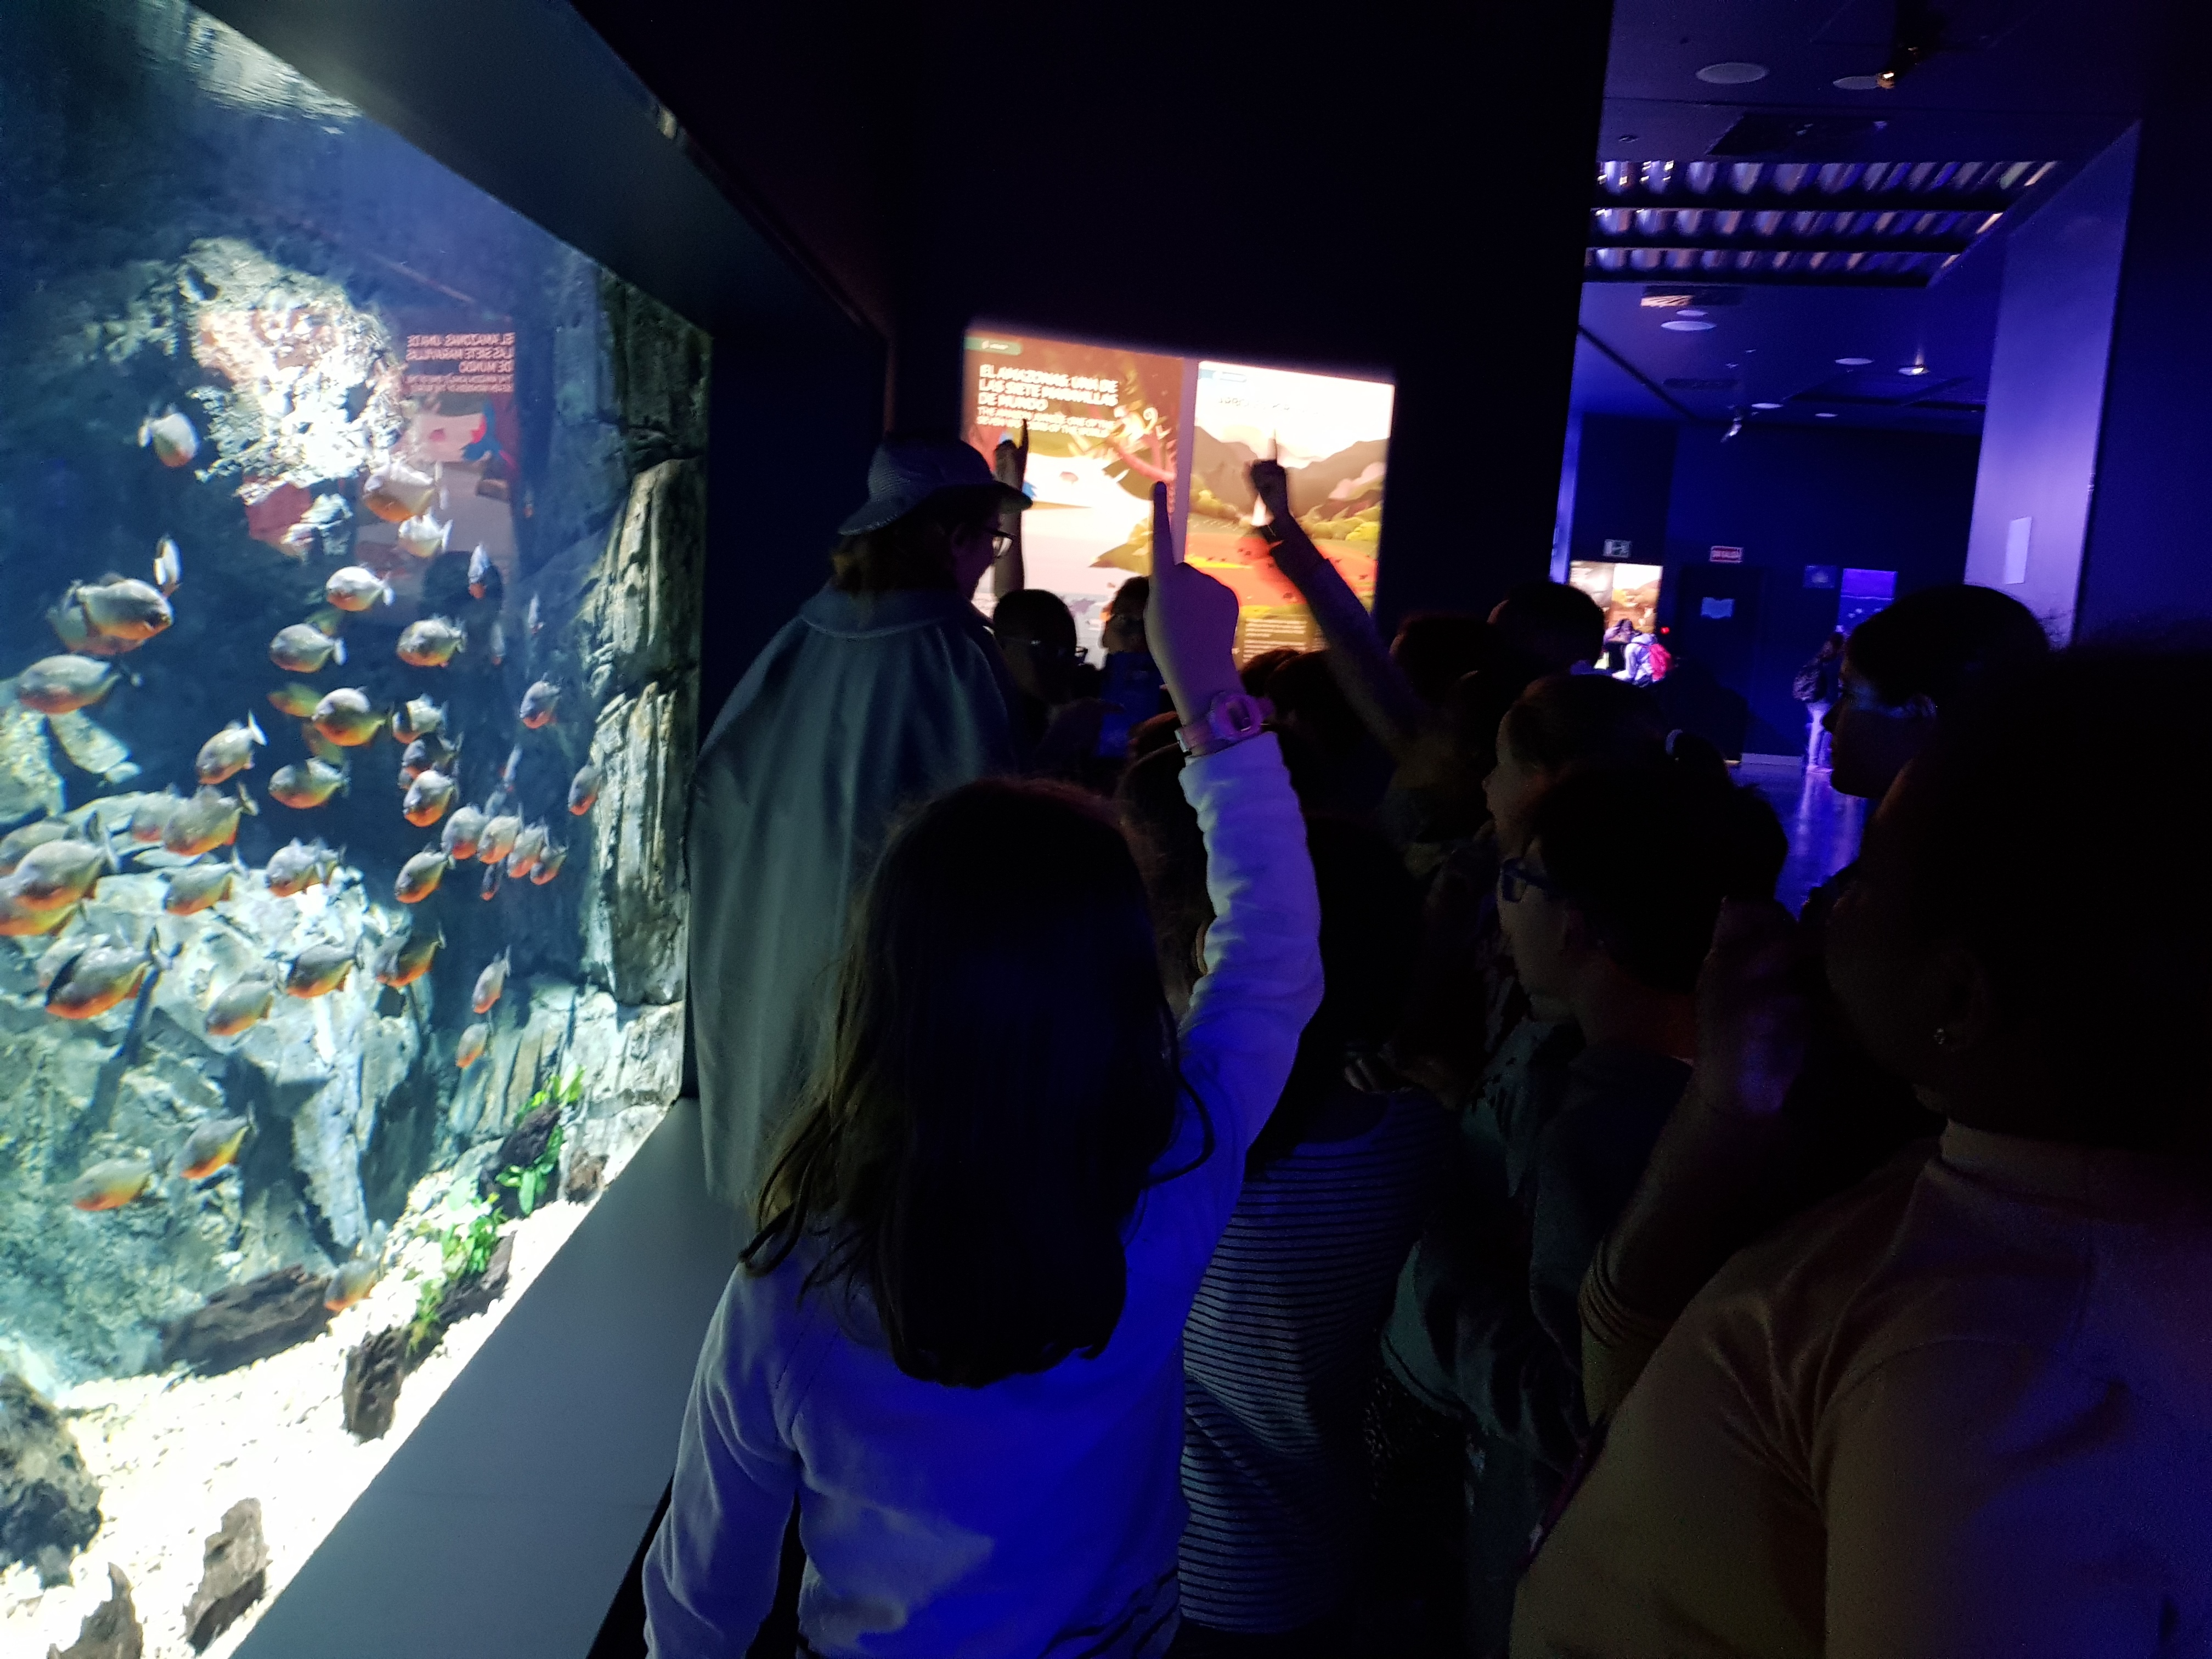 Fotos Aquarium Xanadú 3ºB 15